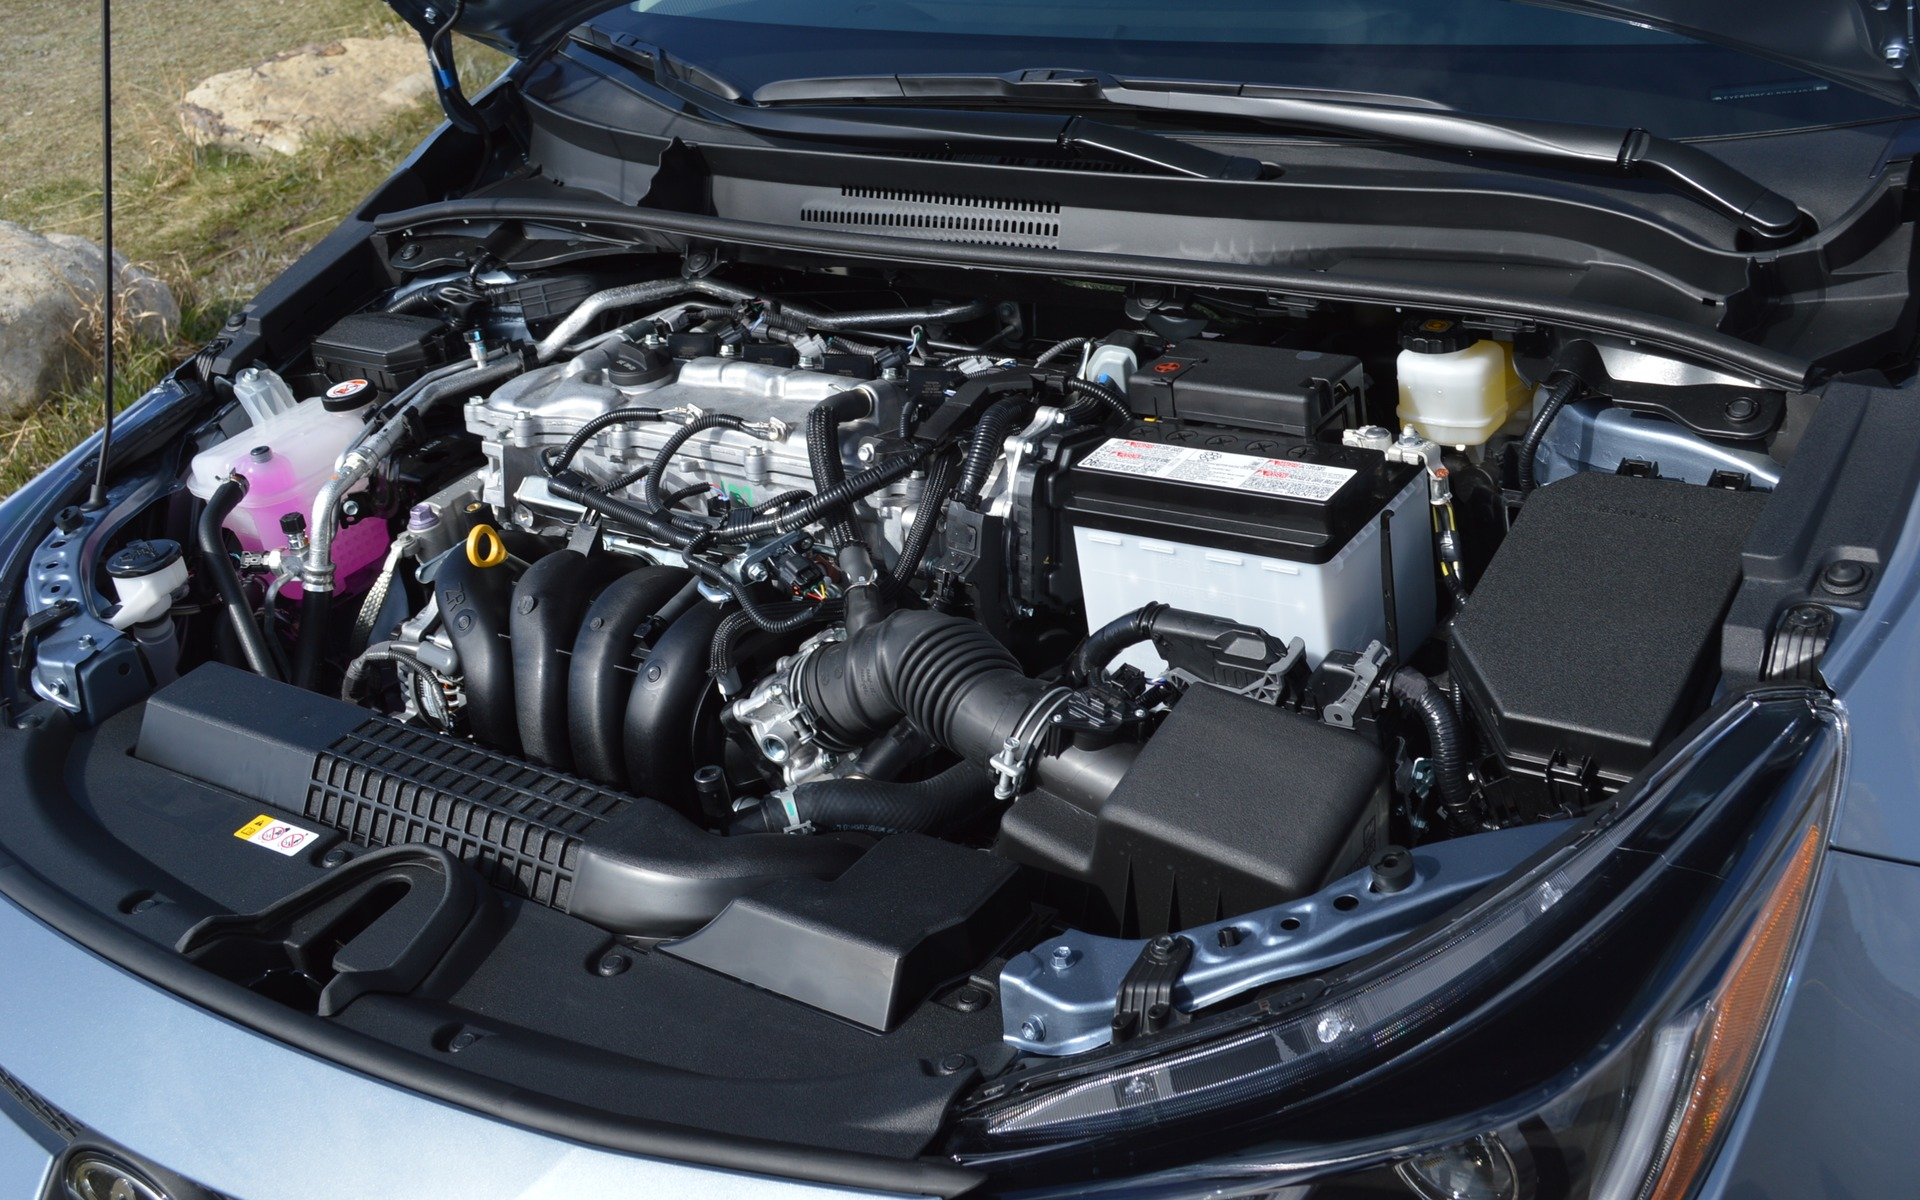 Toyota Corolla 2020: La Corolla beige n'existe plus. Ou presque… 376896_Toyota_Corolla_2020_La_Corolla_beige_n_existe_plus_En_fait_presque